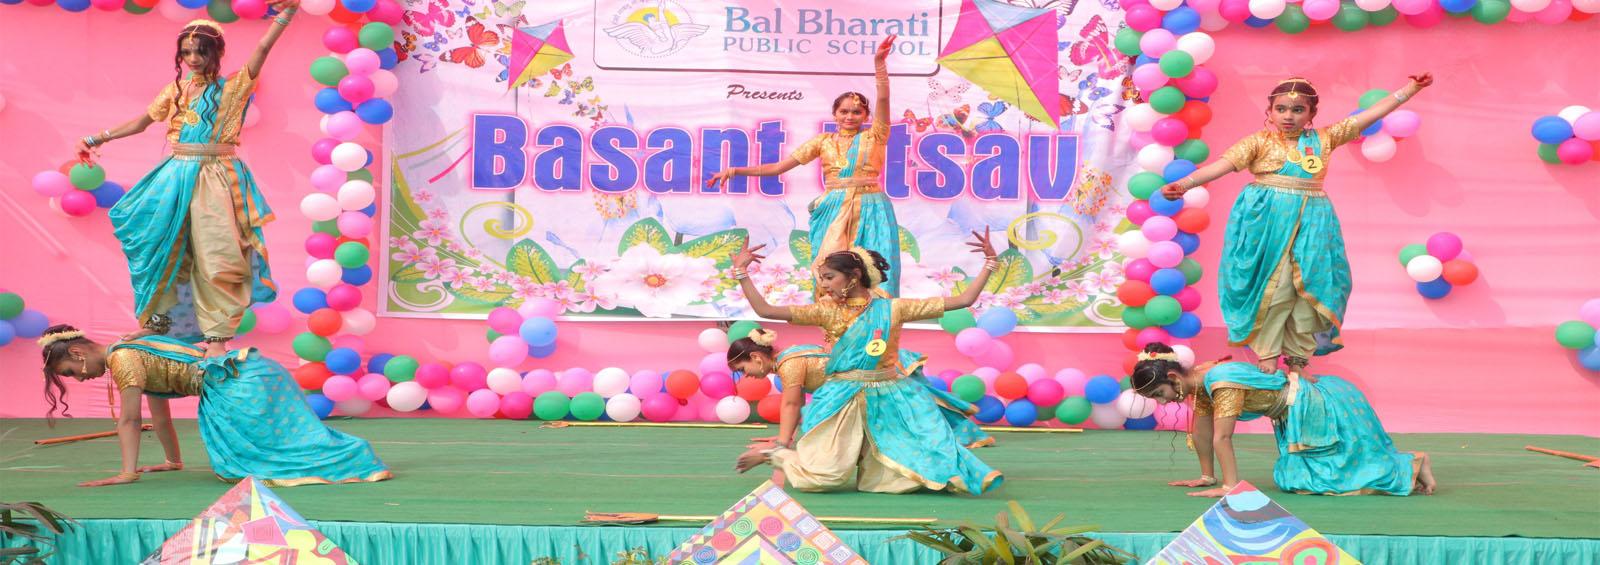 Basant Utsav